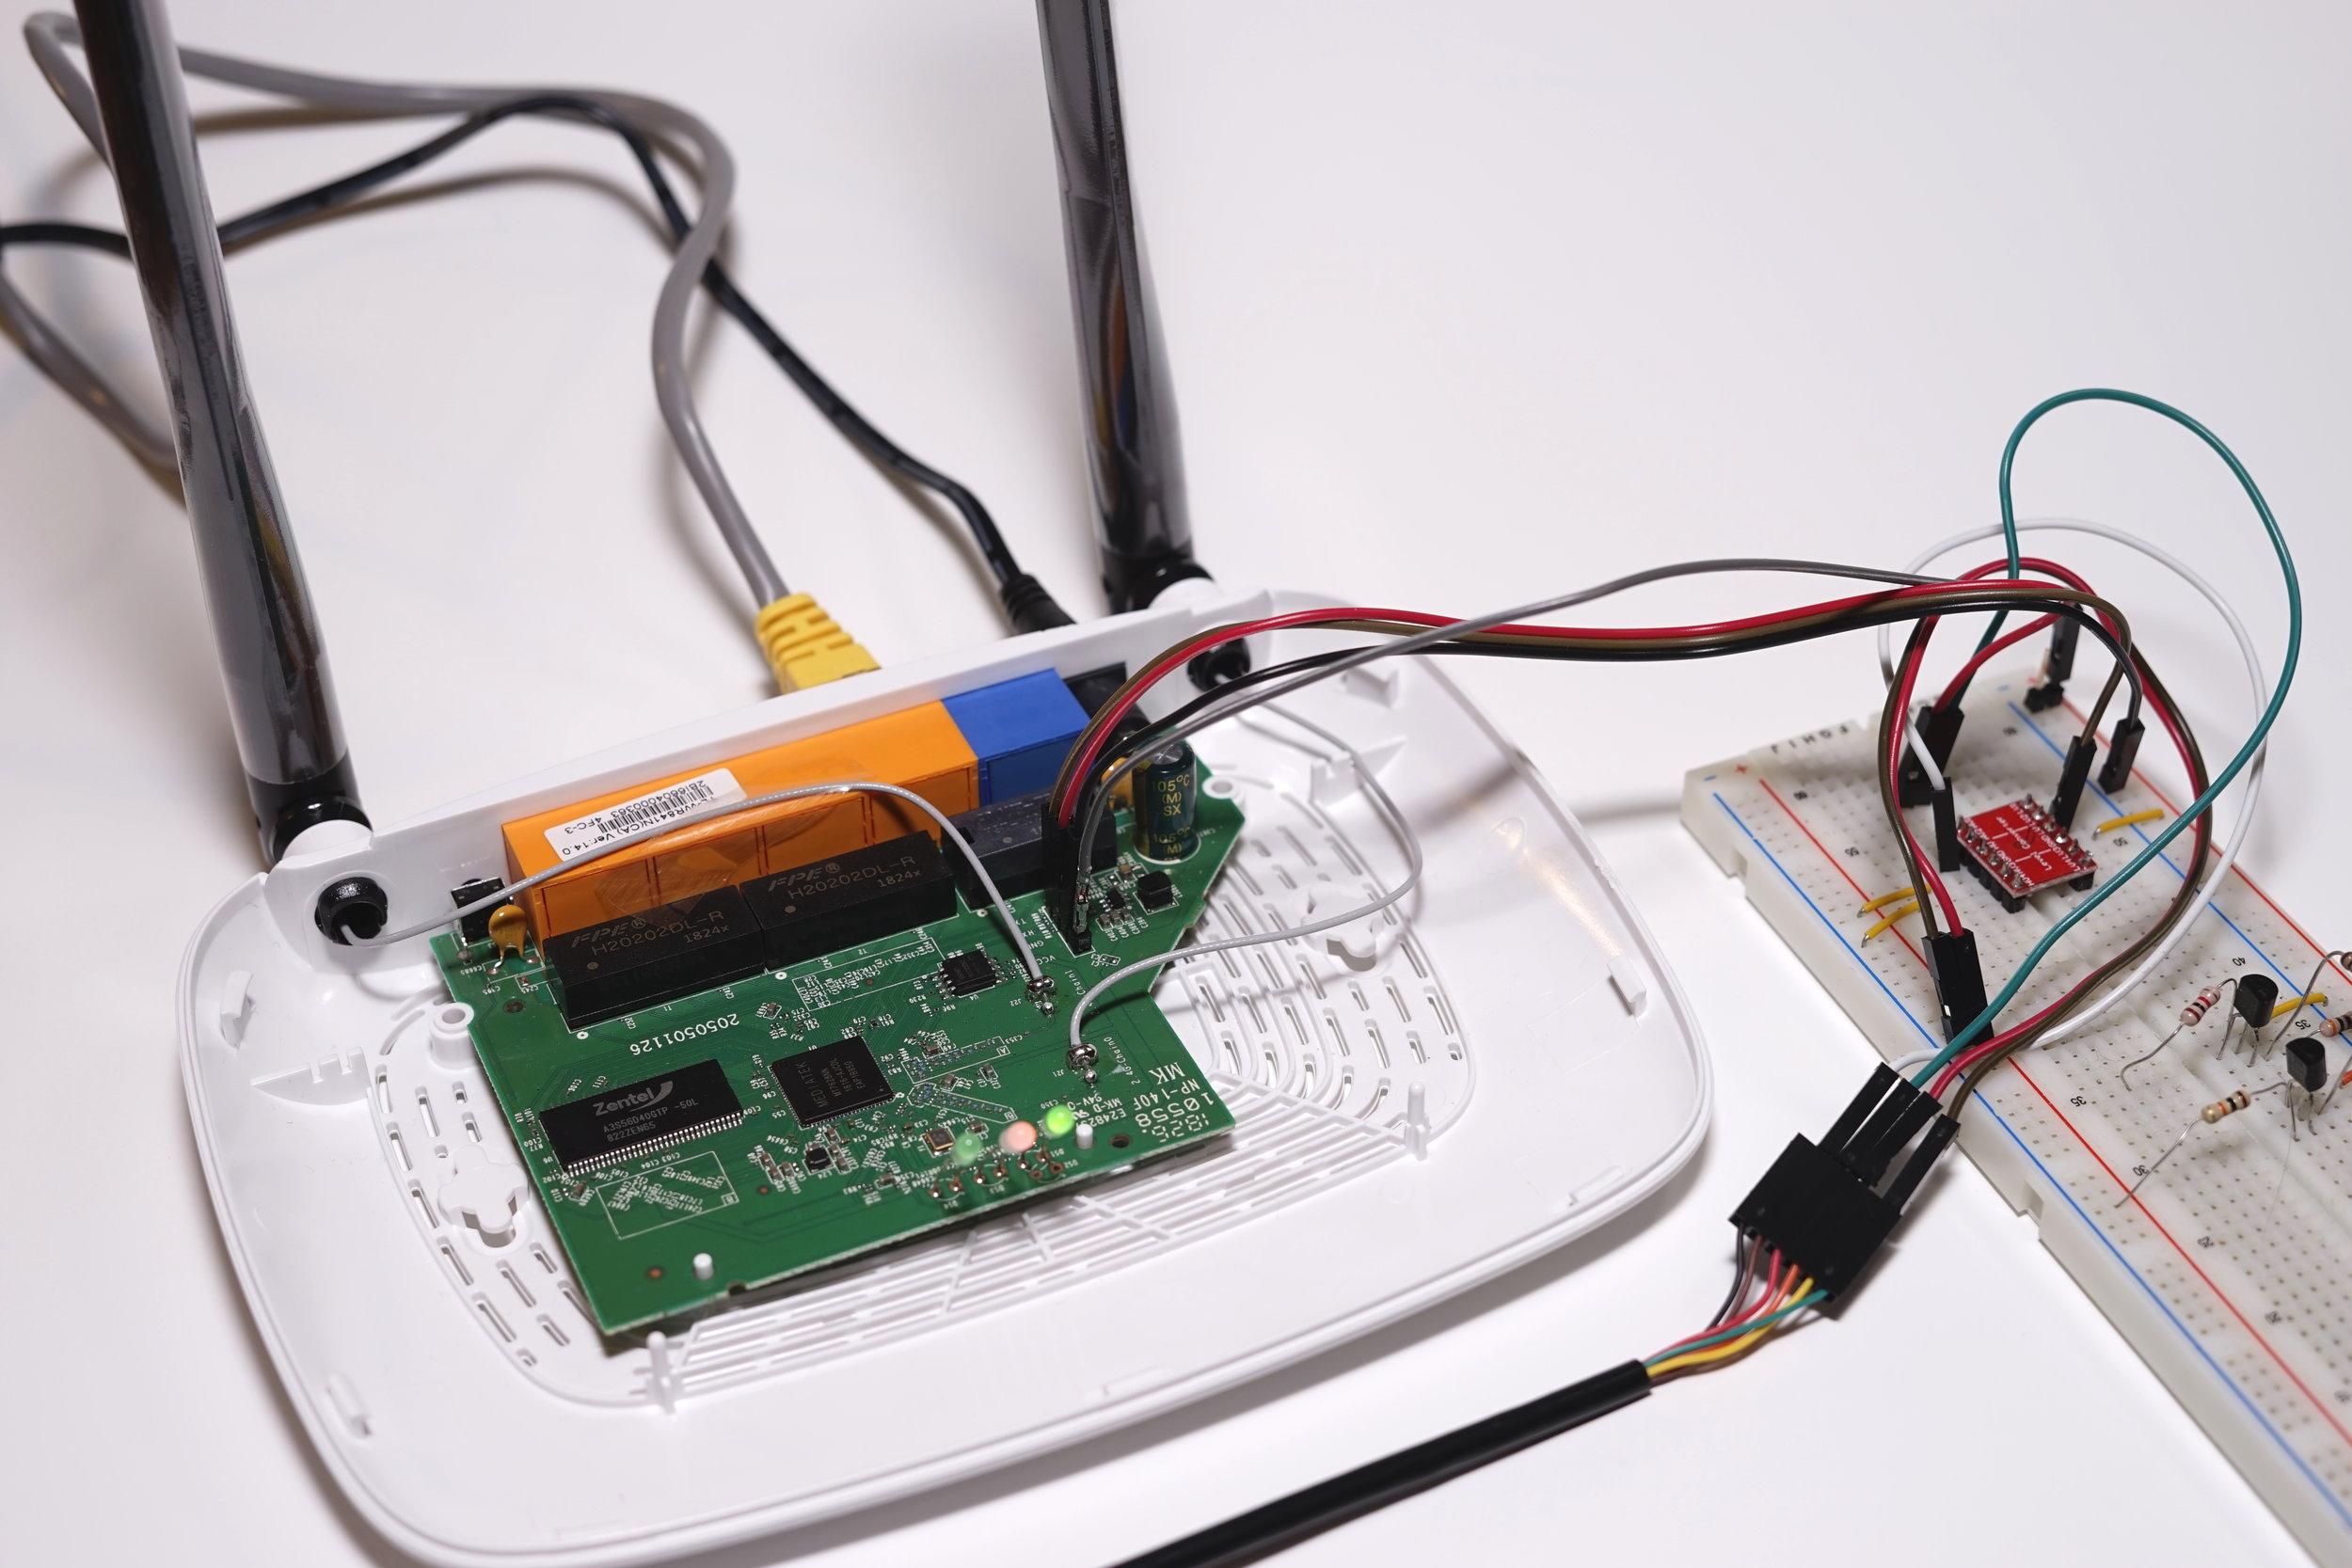 Figure 15 - Complete hardware setup